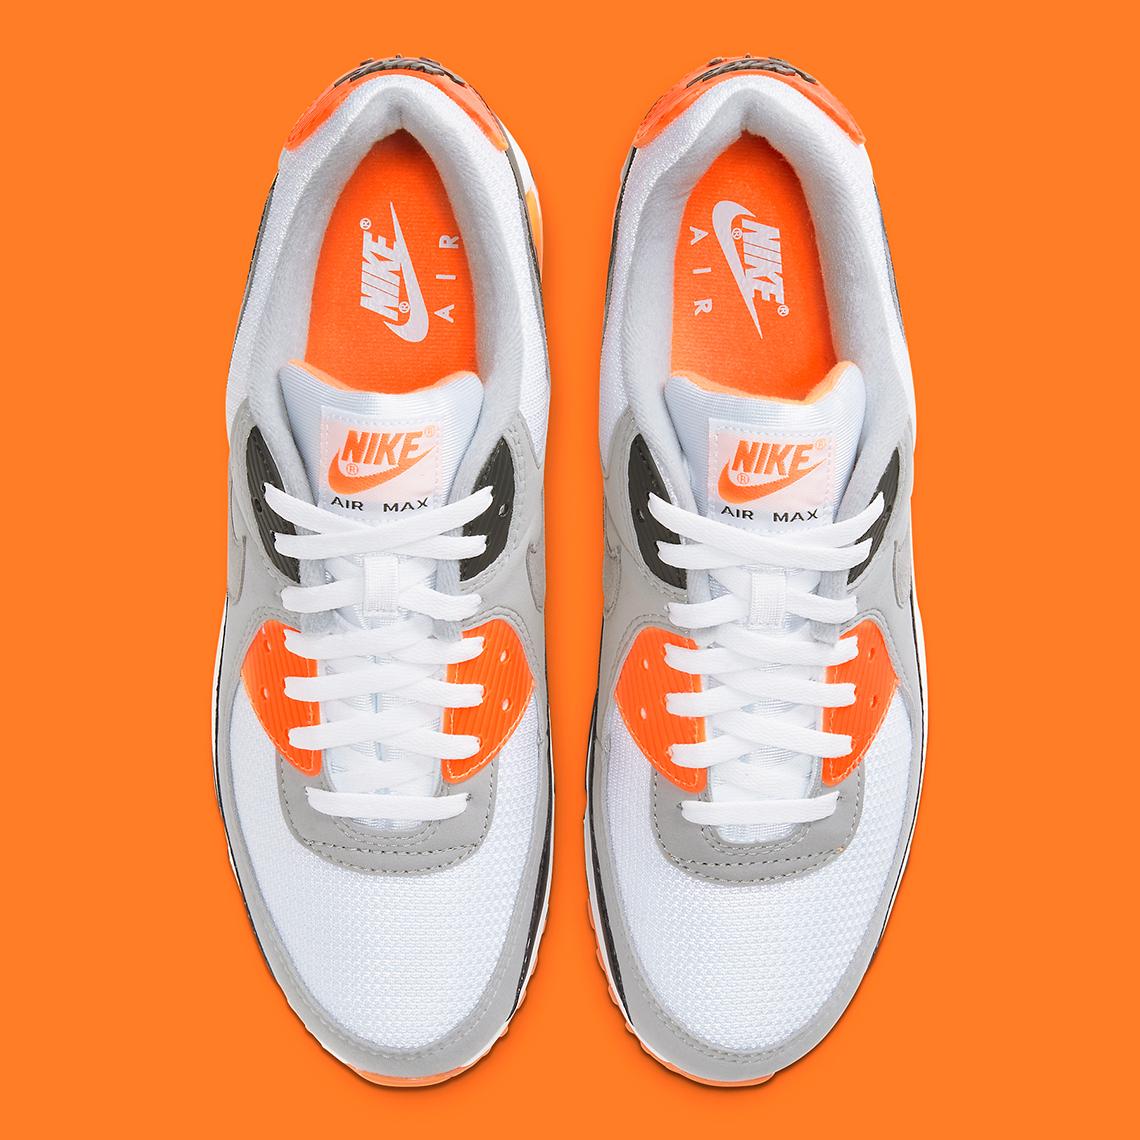 Nike Air Max 90 Orange White Black CW5458-101 | SneakerNews.com